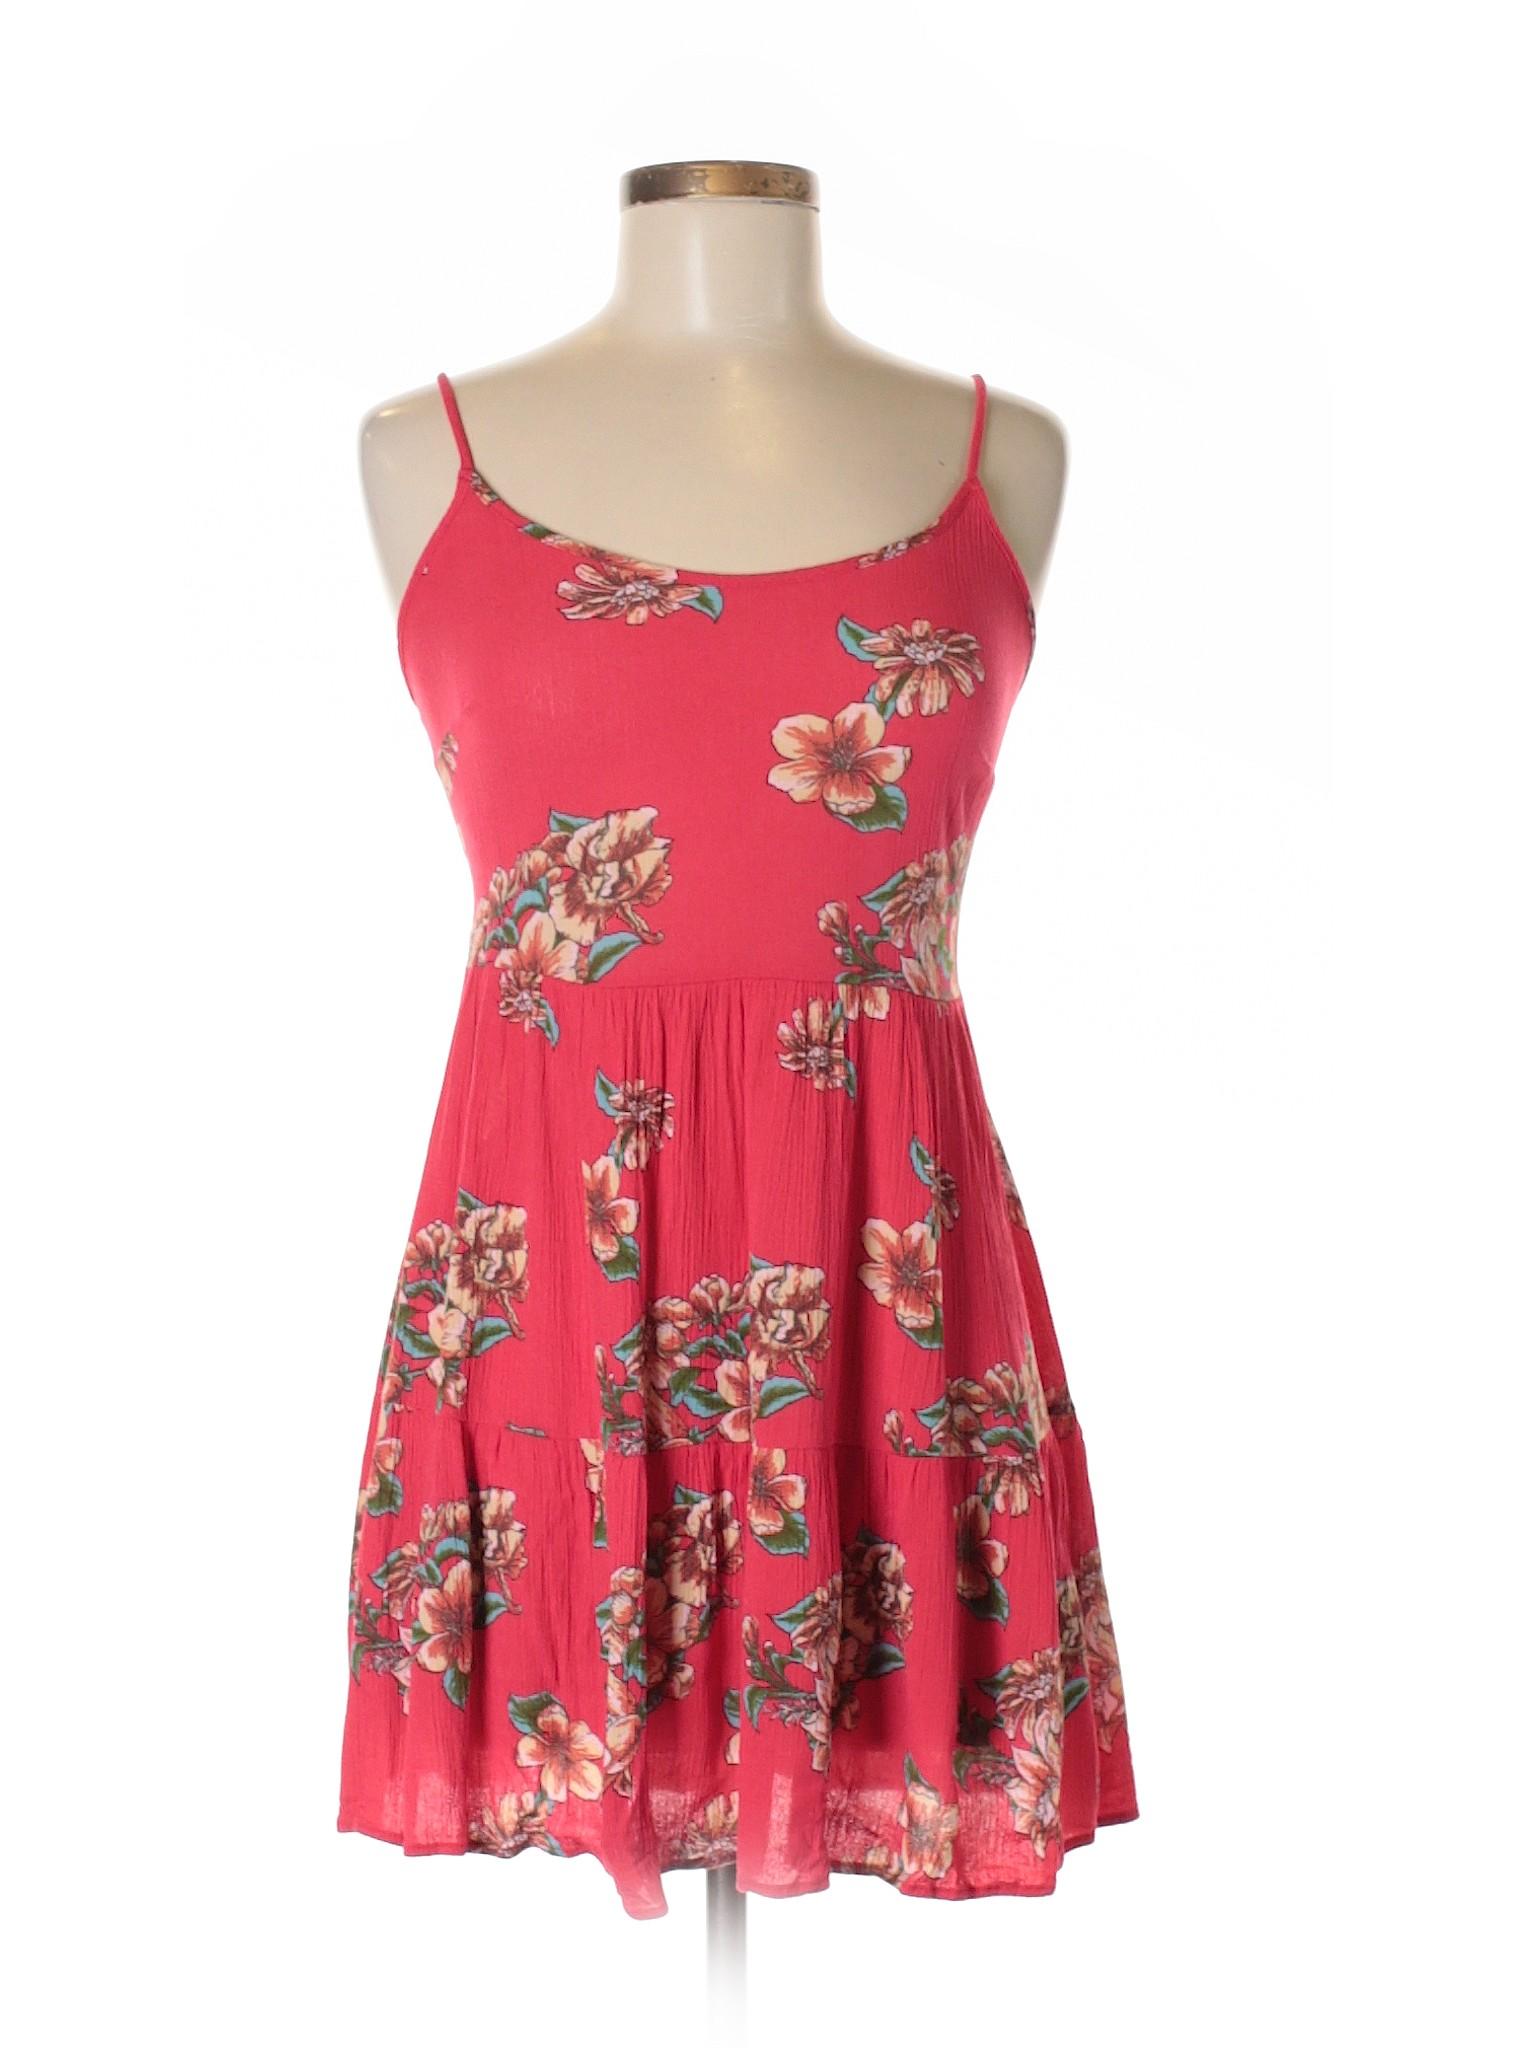 Casual Selling Selling Lulu's Selling Dress Dress Casual Dress Lulu's Selling Dress Casual Lulu's Lulu's Casual FXwyqwHt